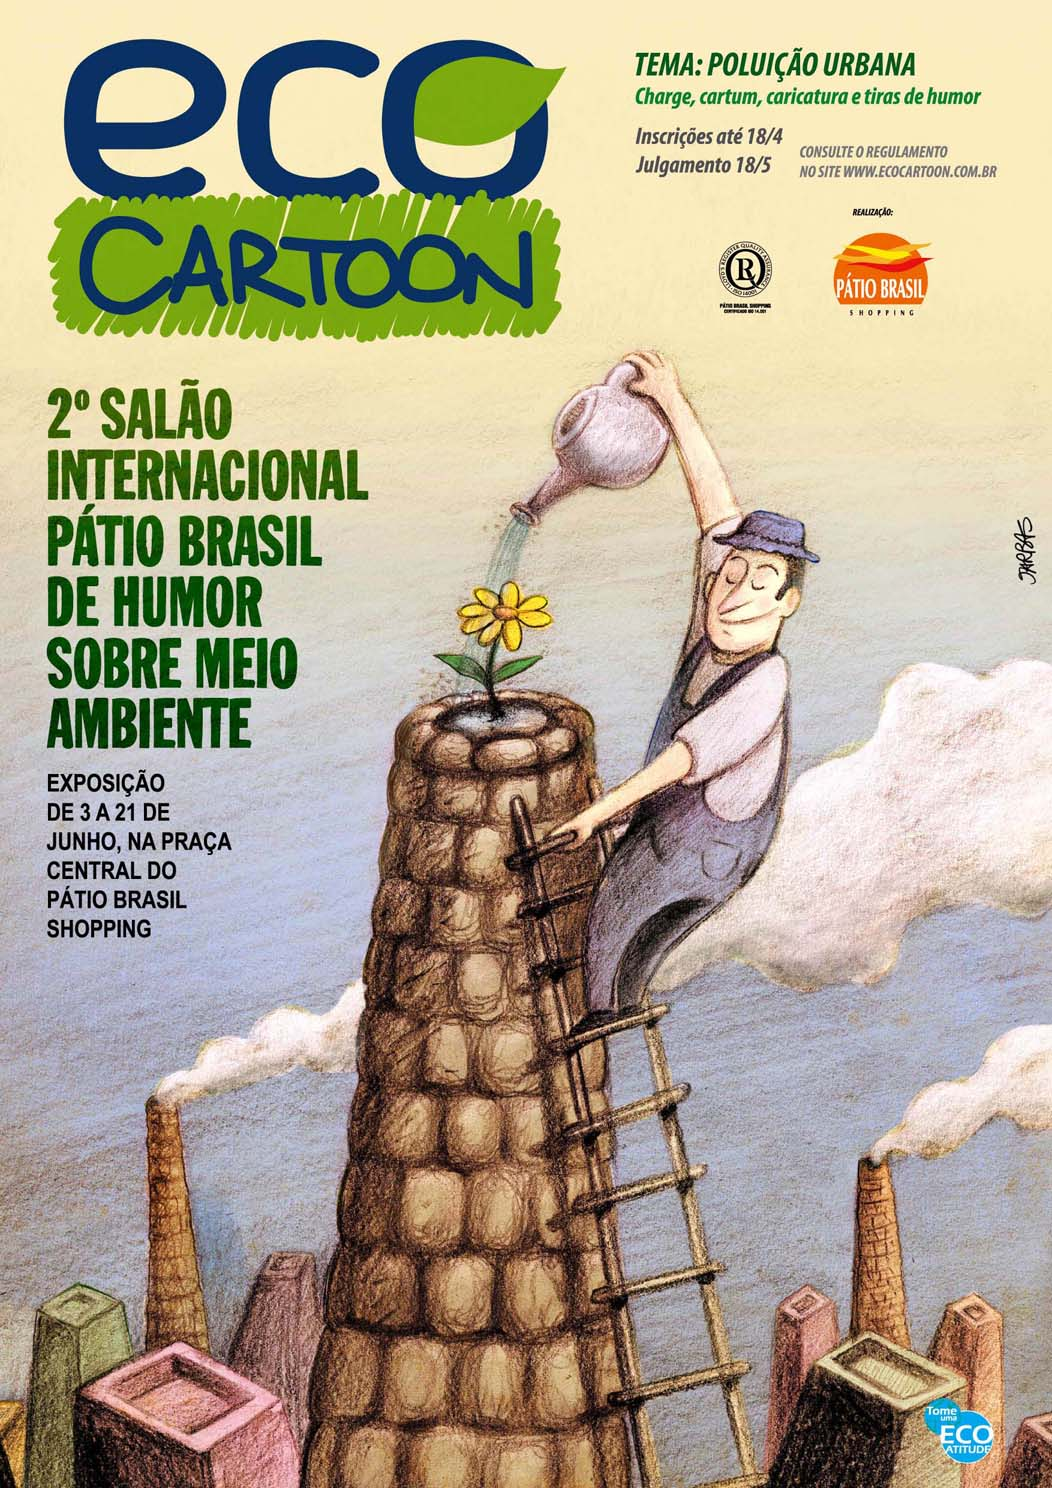 http://carlosscomazzon.files.wordpress.com/2009/02/agnelo_cartaz.jpg